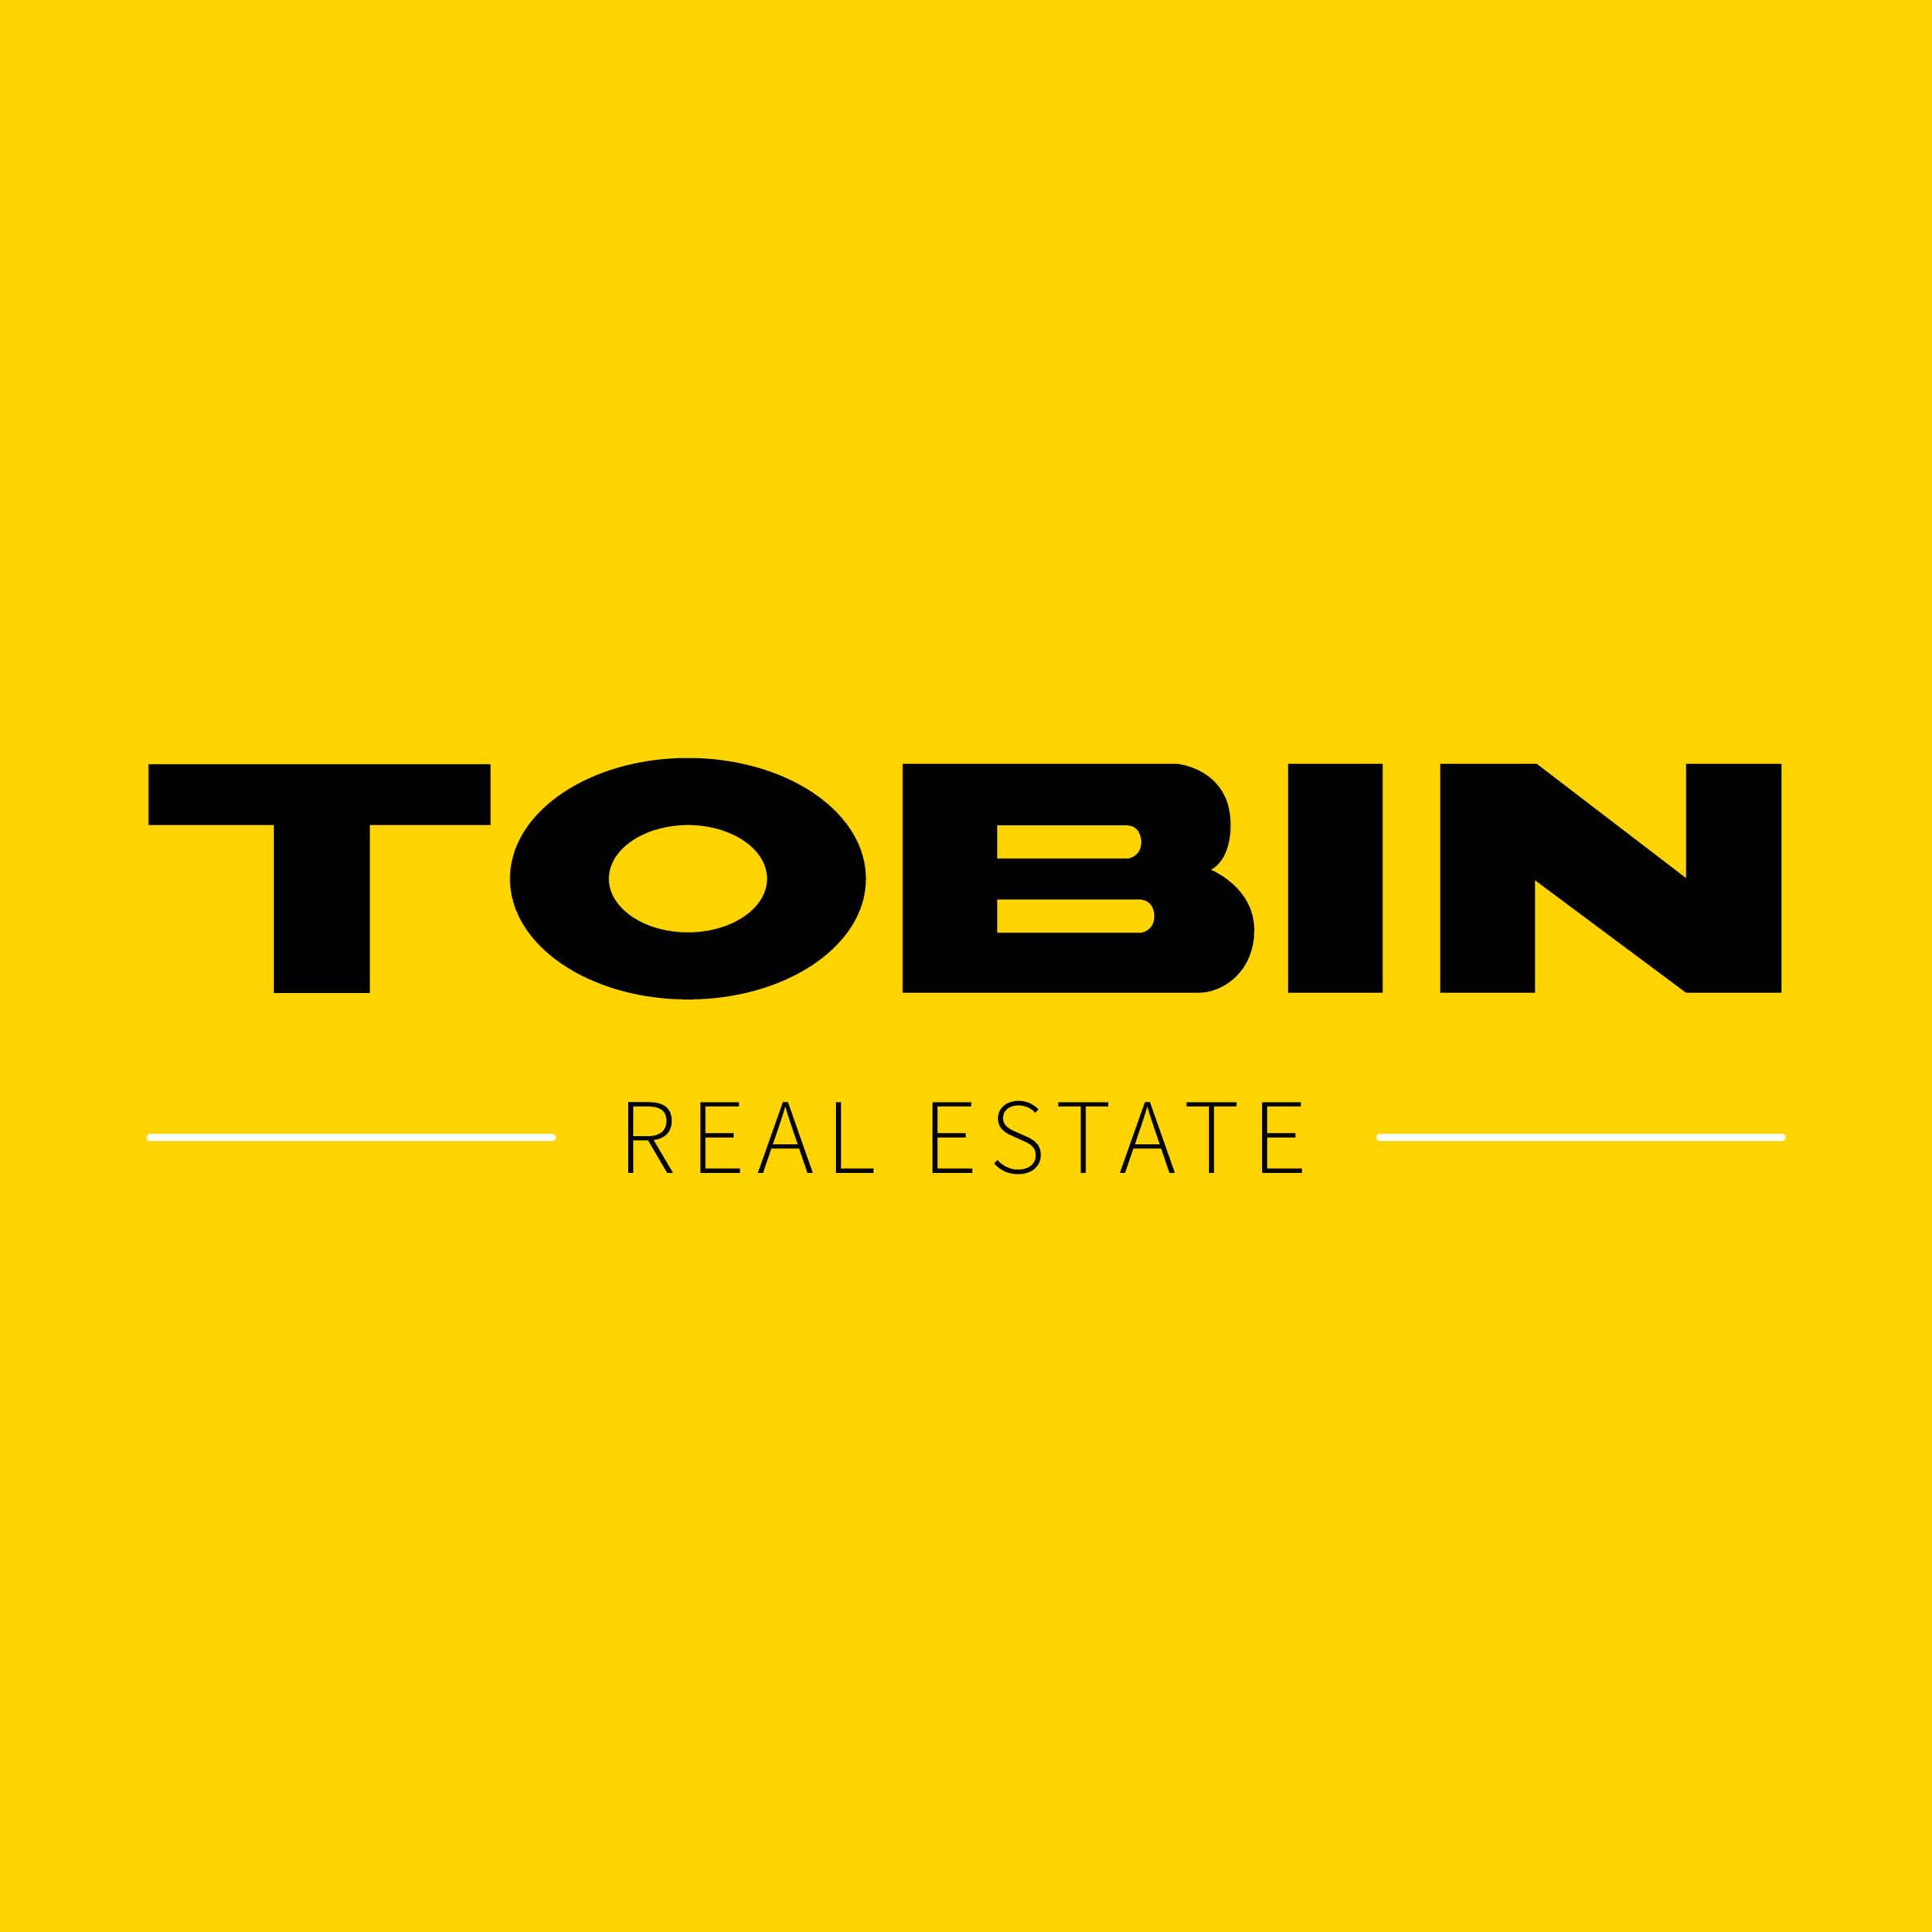 Tobin-FB-Profile.jpg